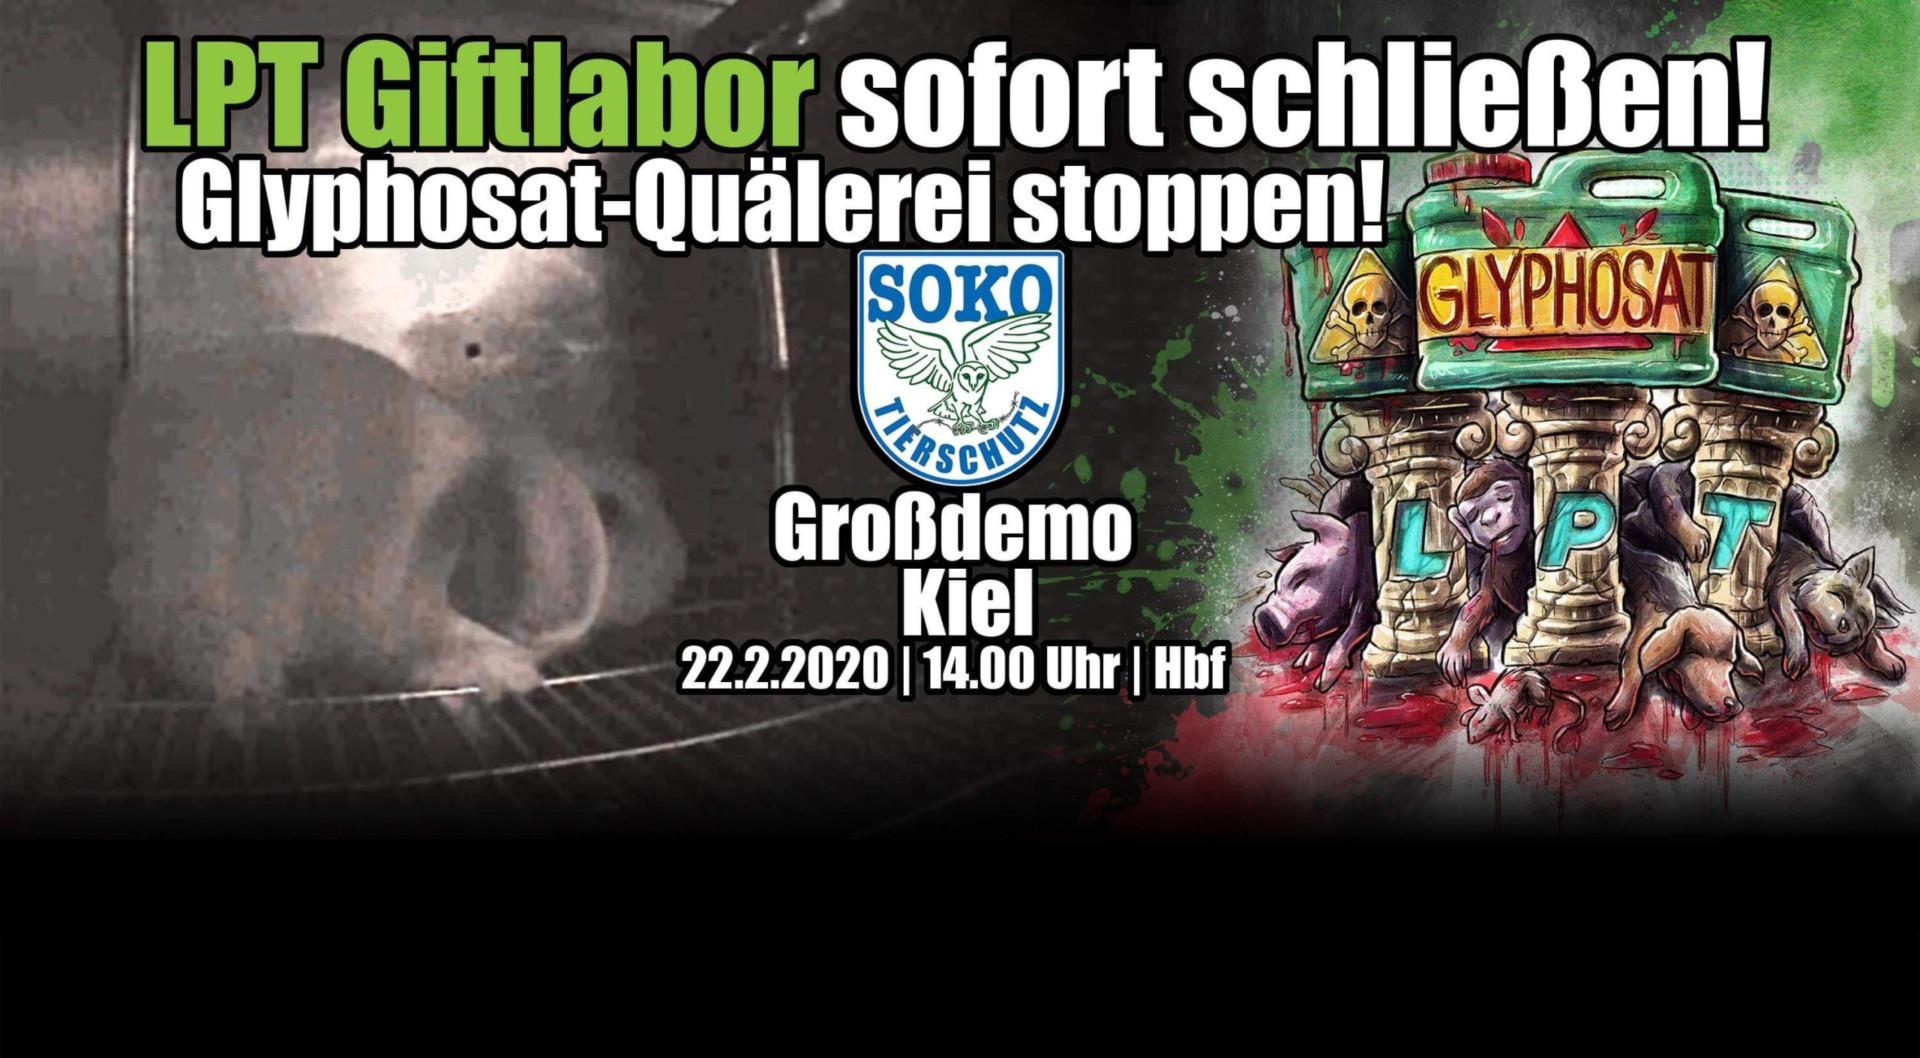 img 3438 scaled - Groß-Demo in Kiel (22.02.) - LPT-Giftlabor sofort schließen